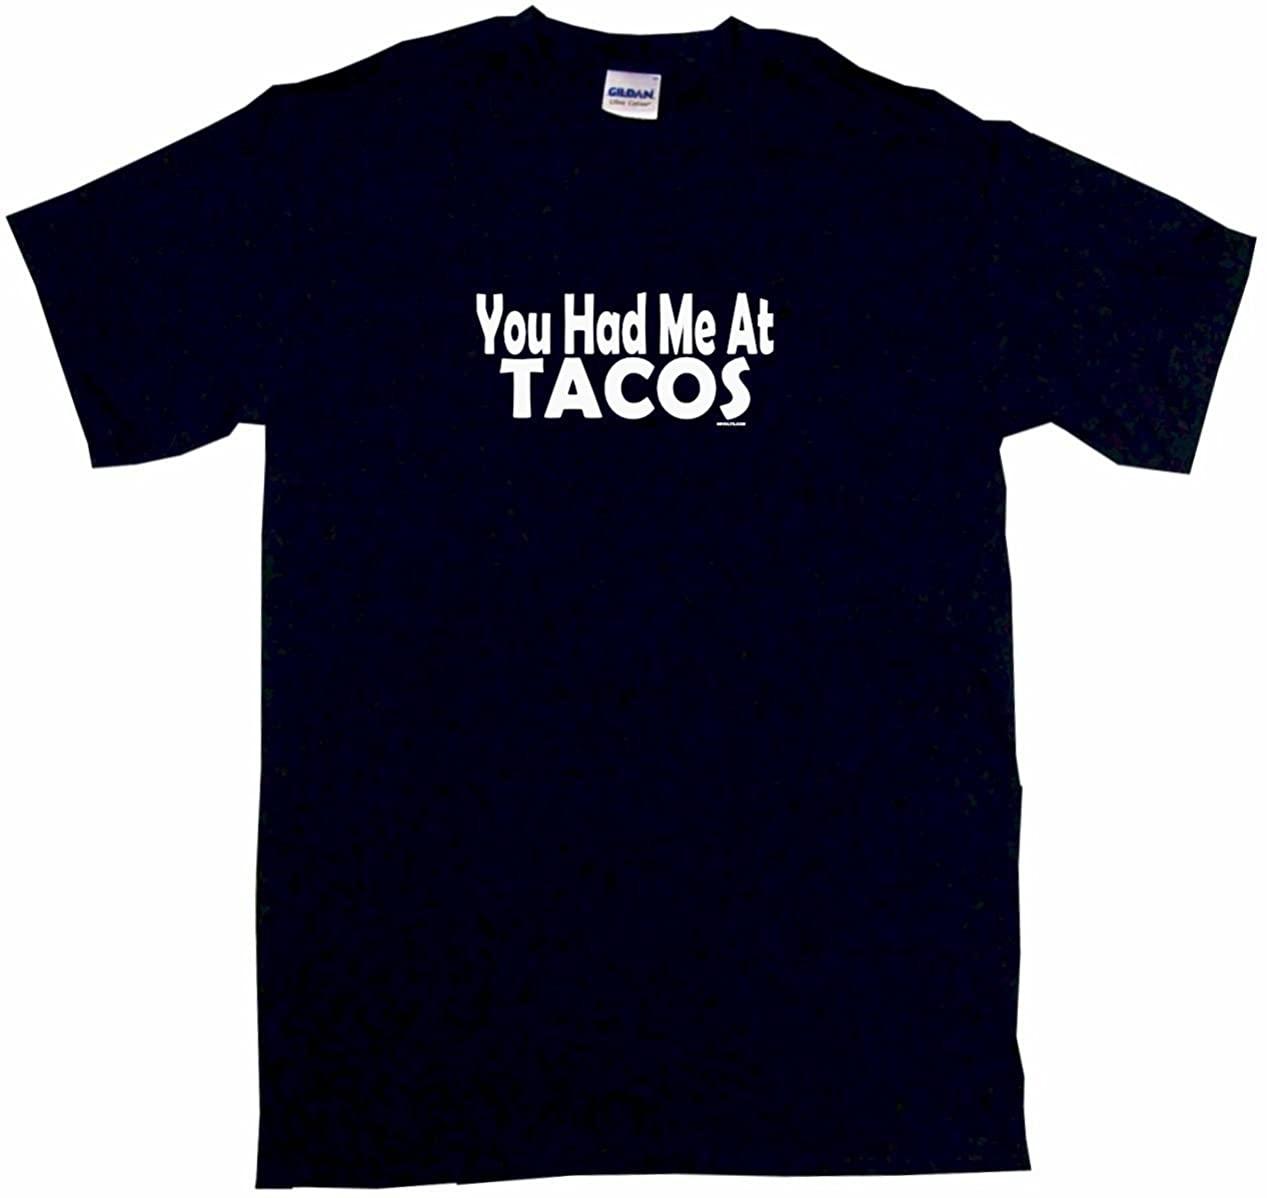 99 Volts You Had Me at Tacos Men's Tee Shirt